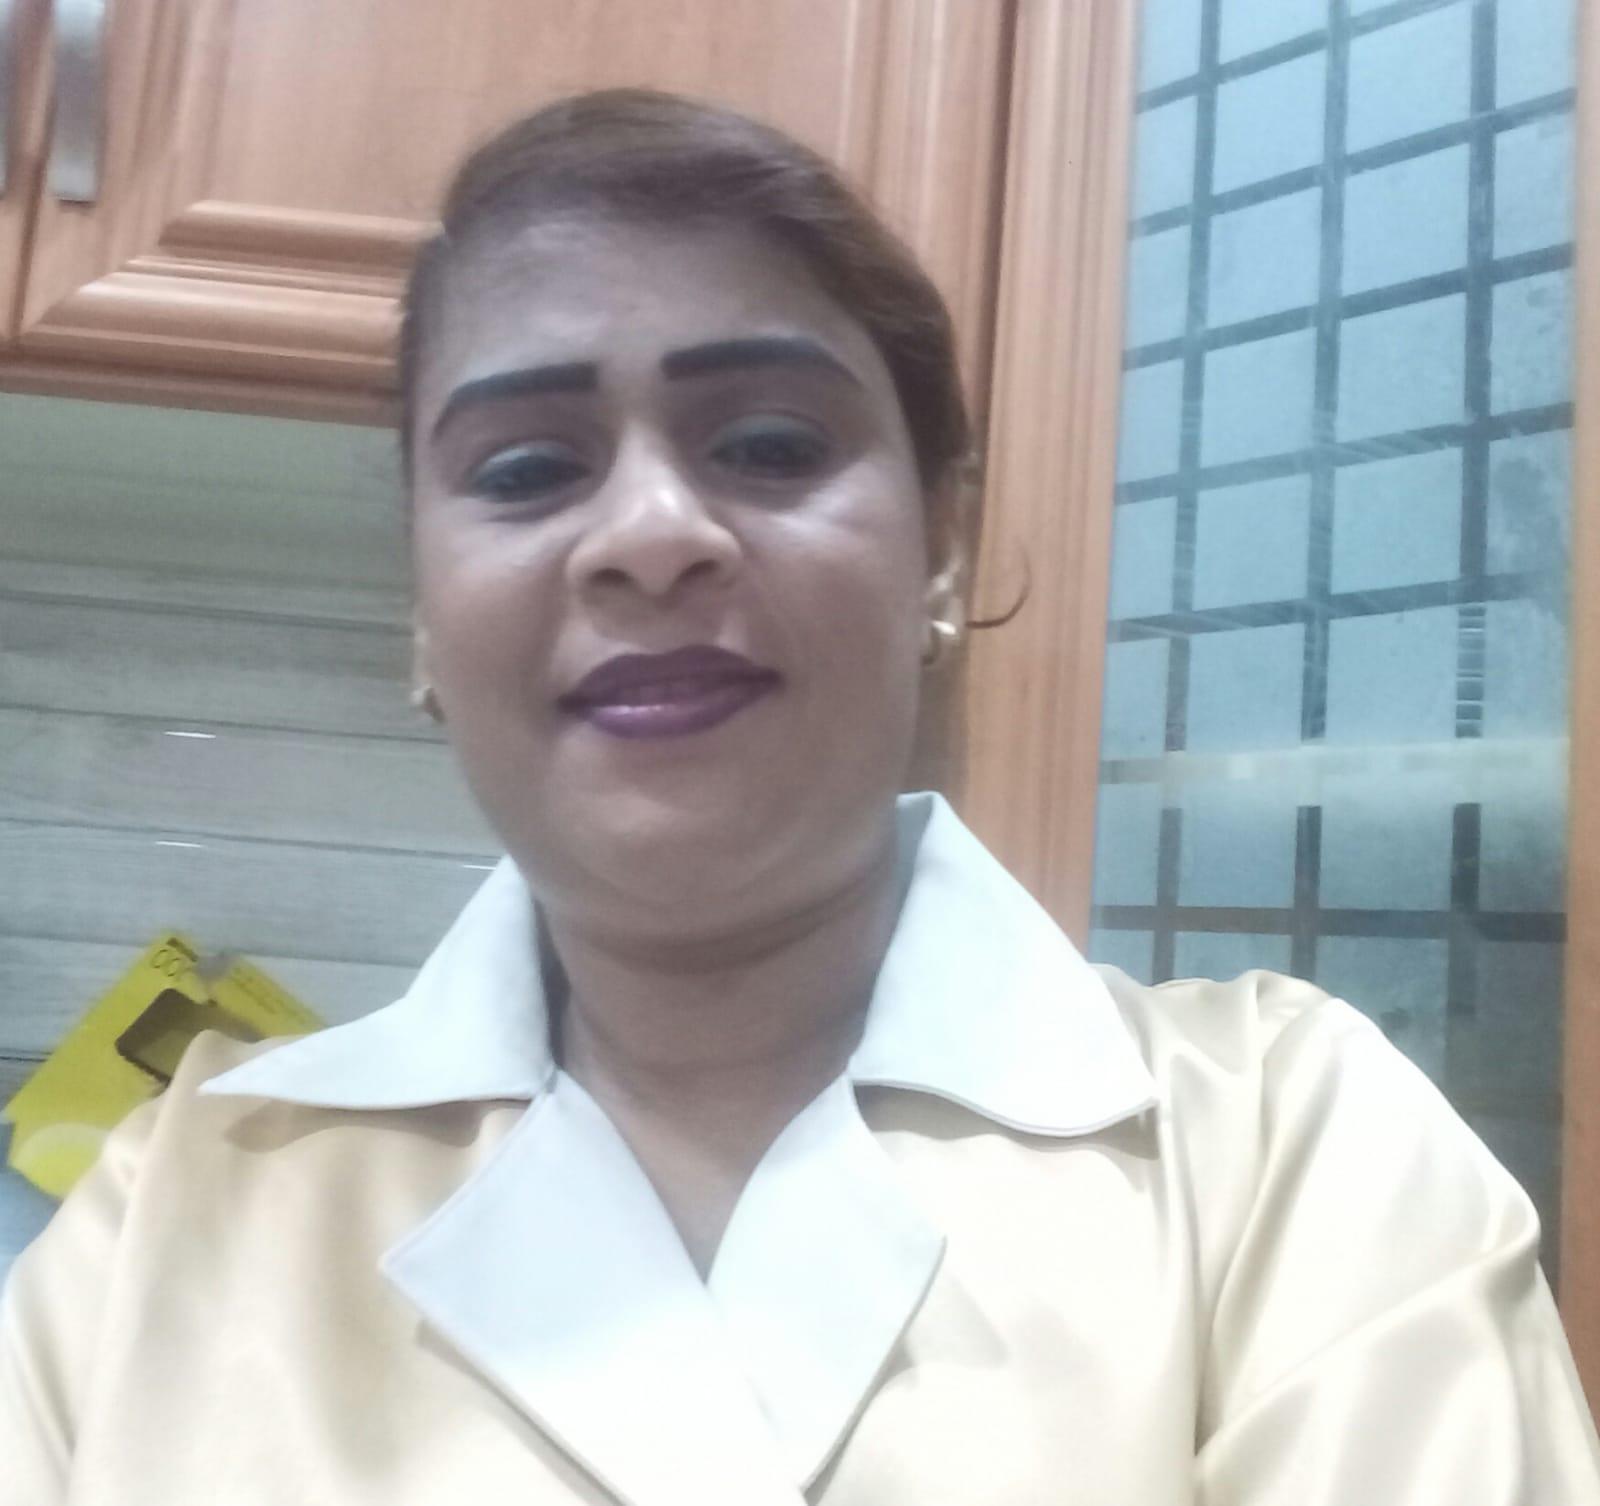 WhatsApp Image 2019-08-05 at 16_IM_2019080712334361.jpeg